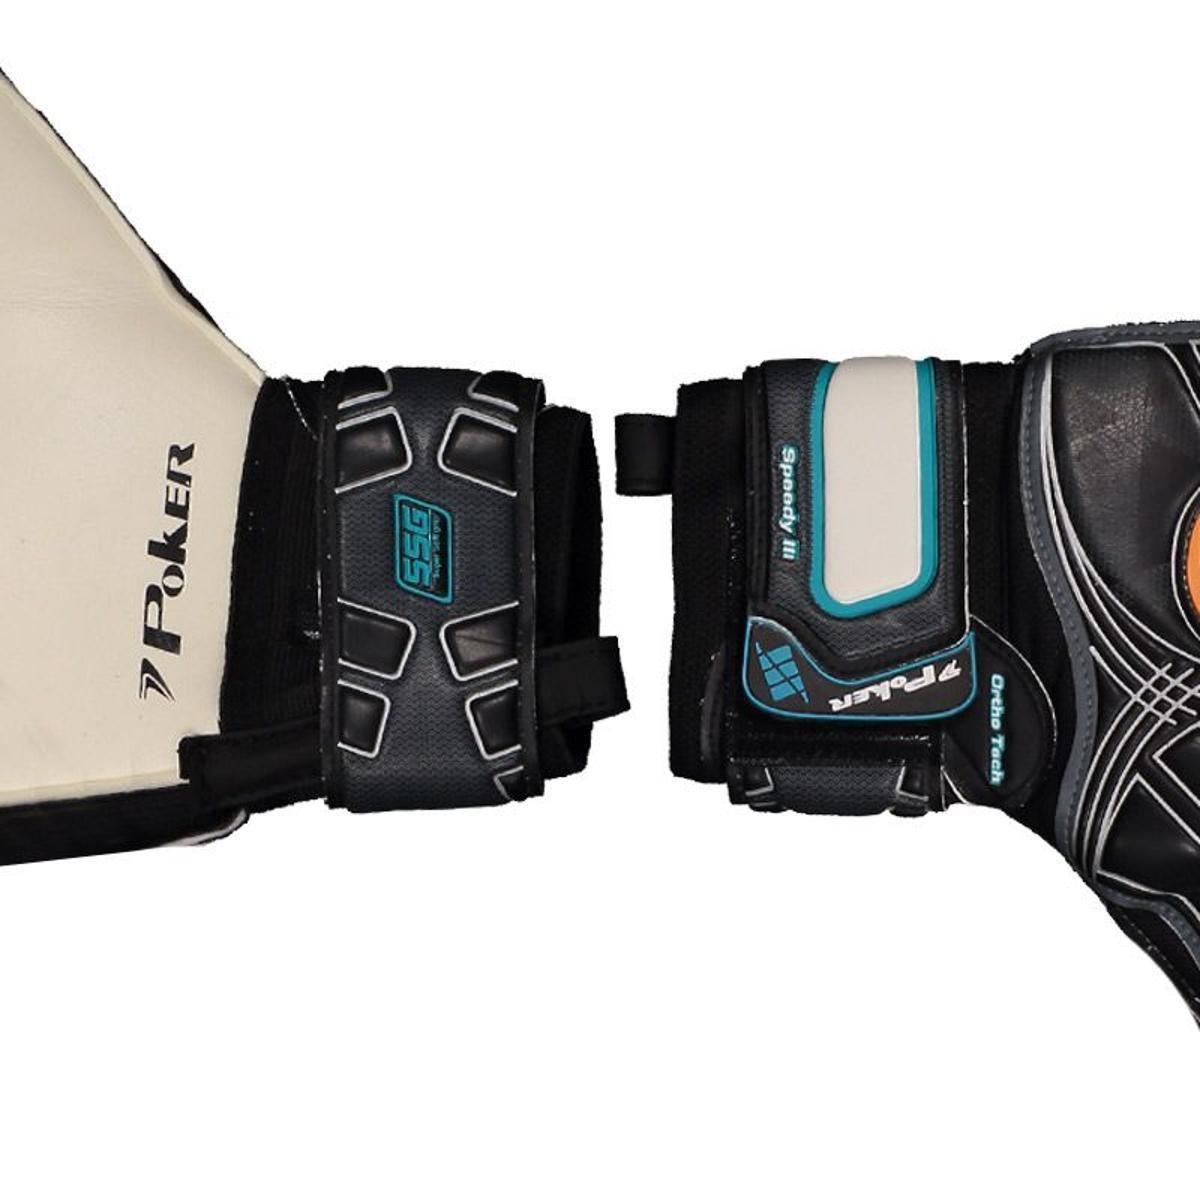 Luva Poker Profissional Speedy 3 Ortho Tech T 9 Fingersave  - Vitoria Esportes